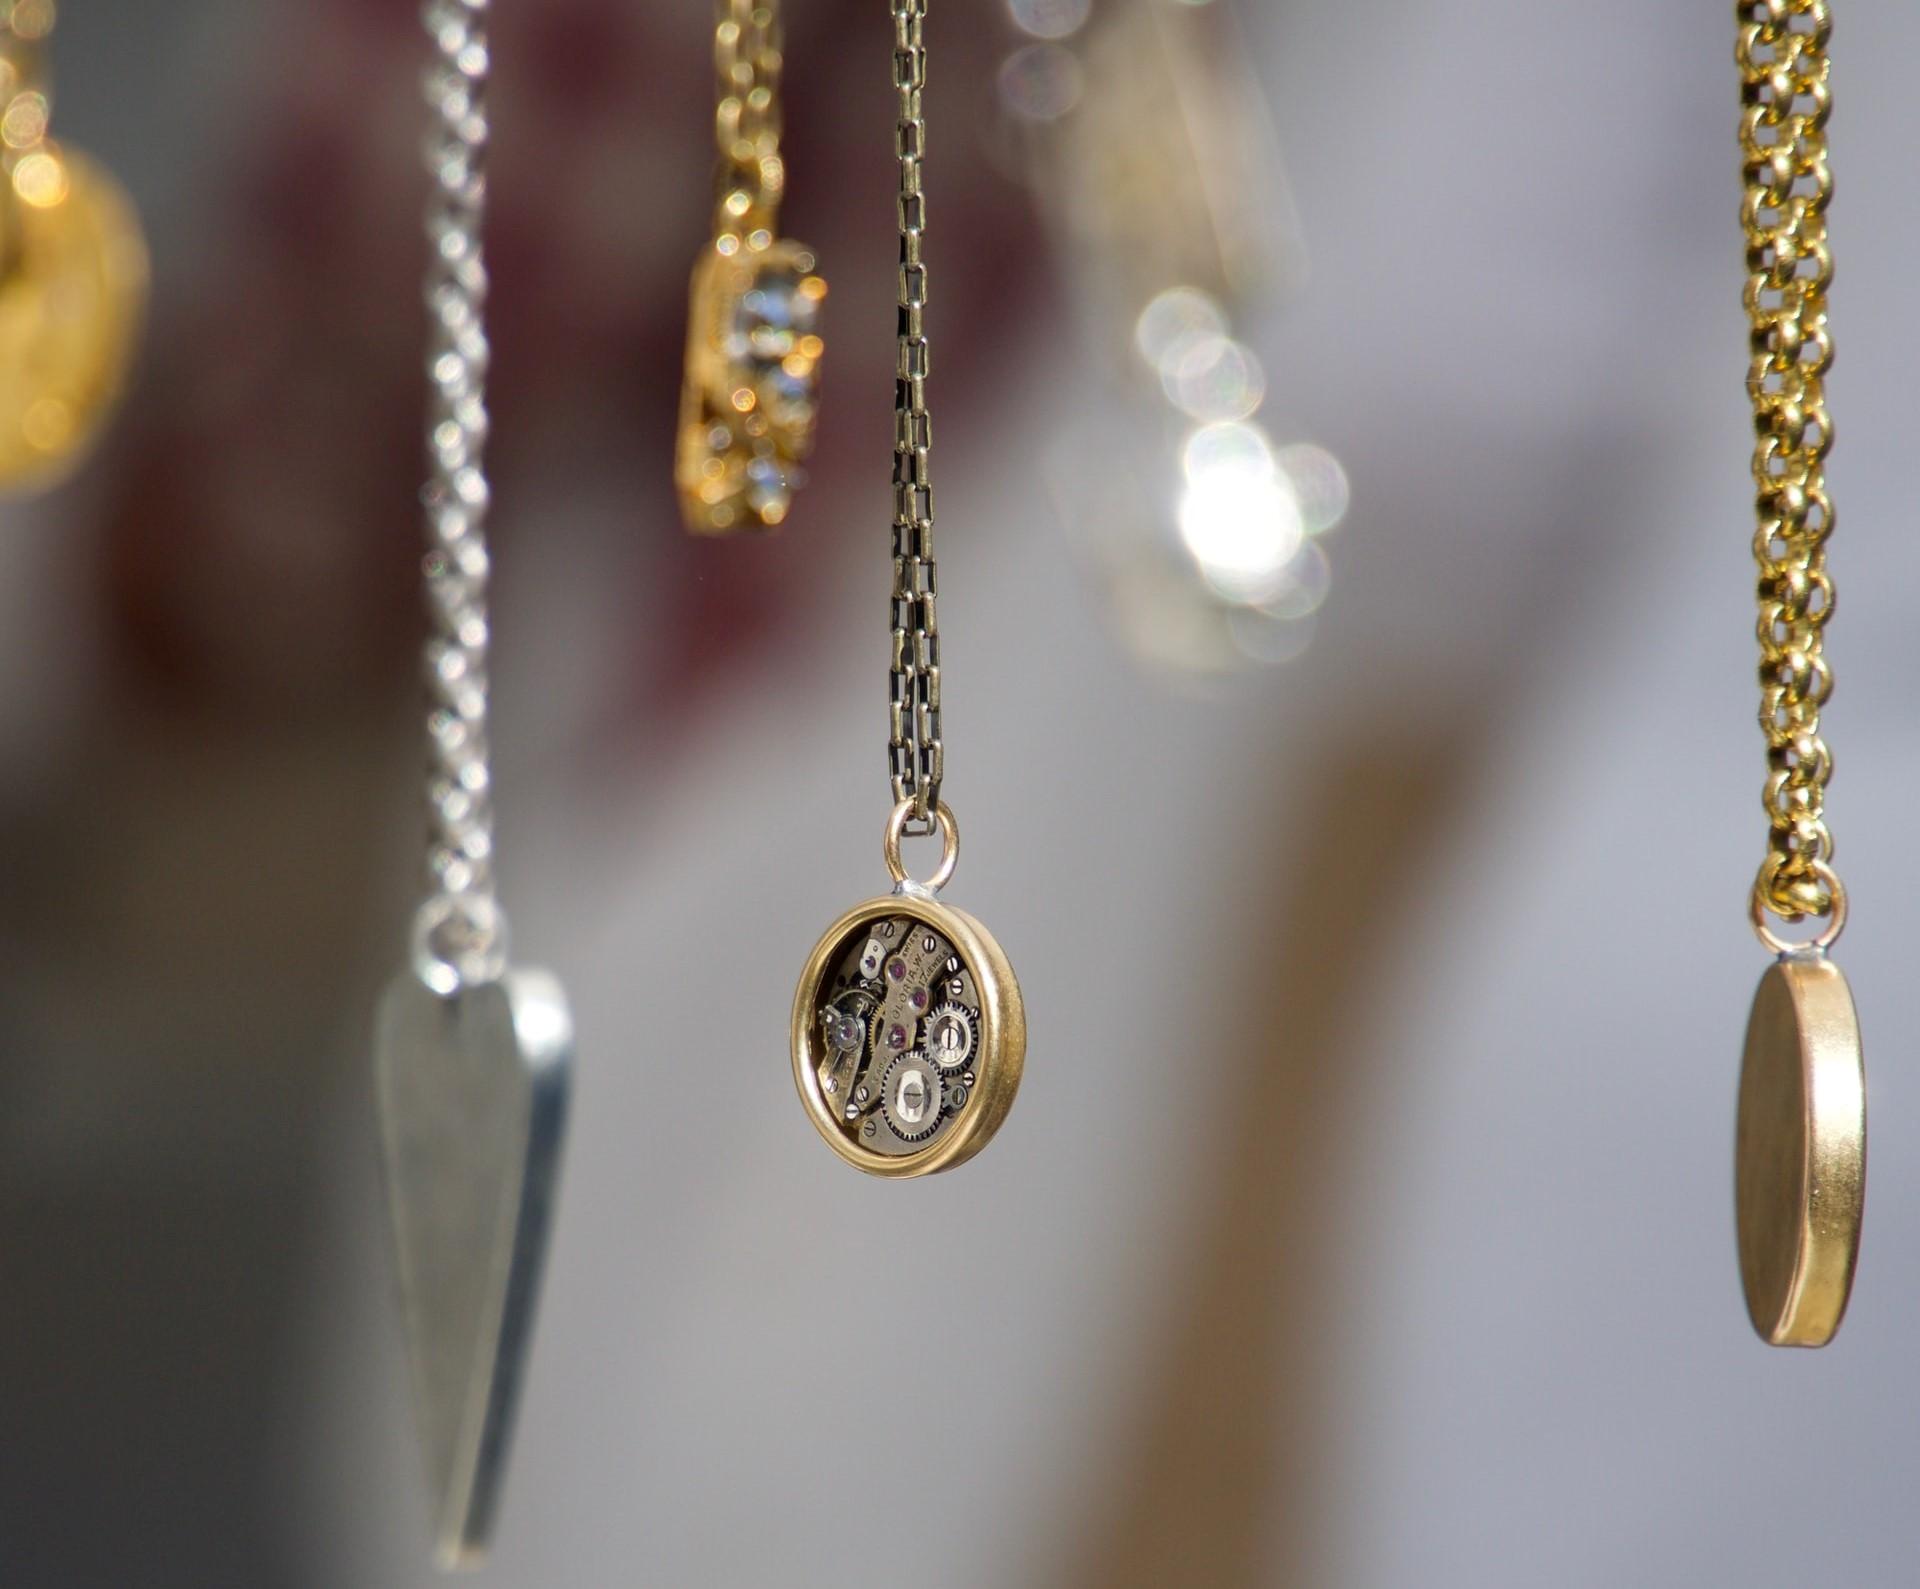 sieraden opbergen tips om sieraden netjes op te bergen opberg ideeën sieraad juwelen opruimen juwelendoosje sieradendoosje sieradenschaaltje blog